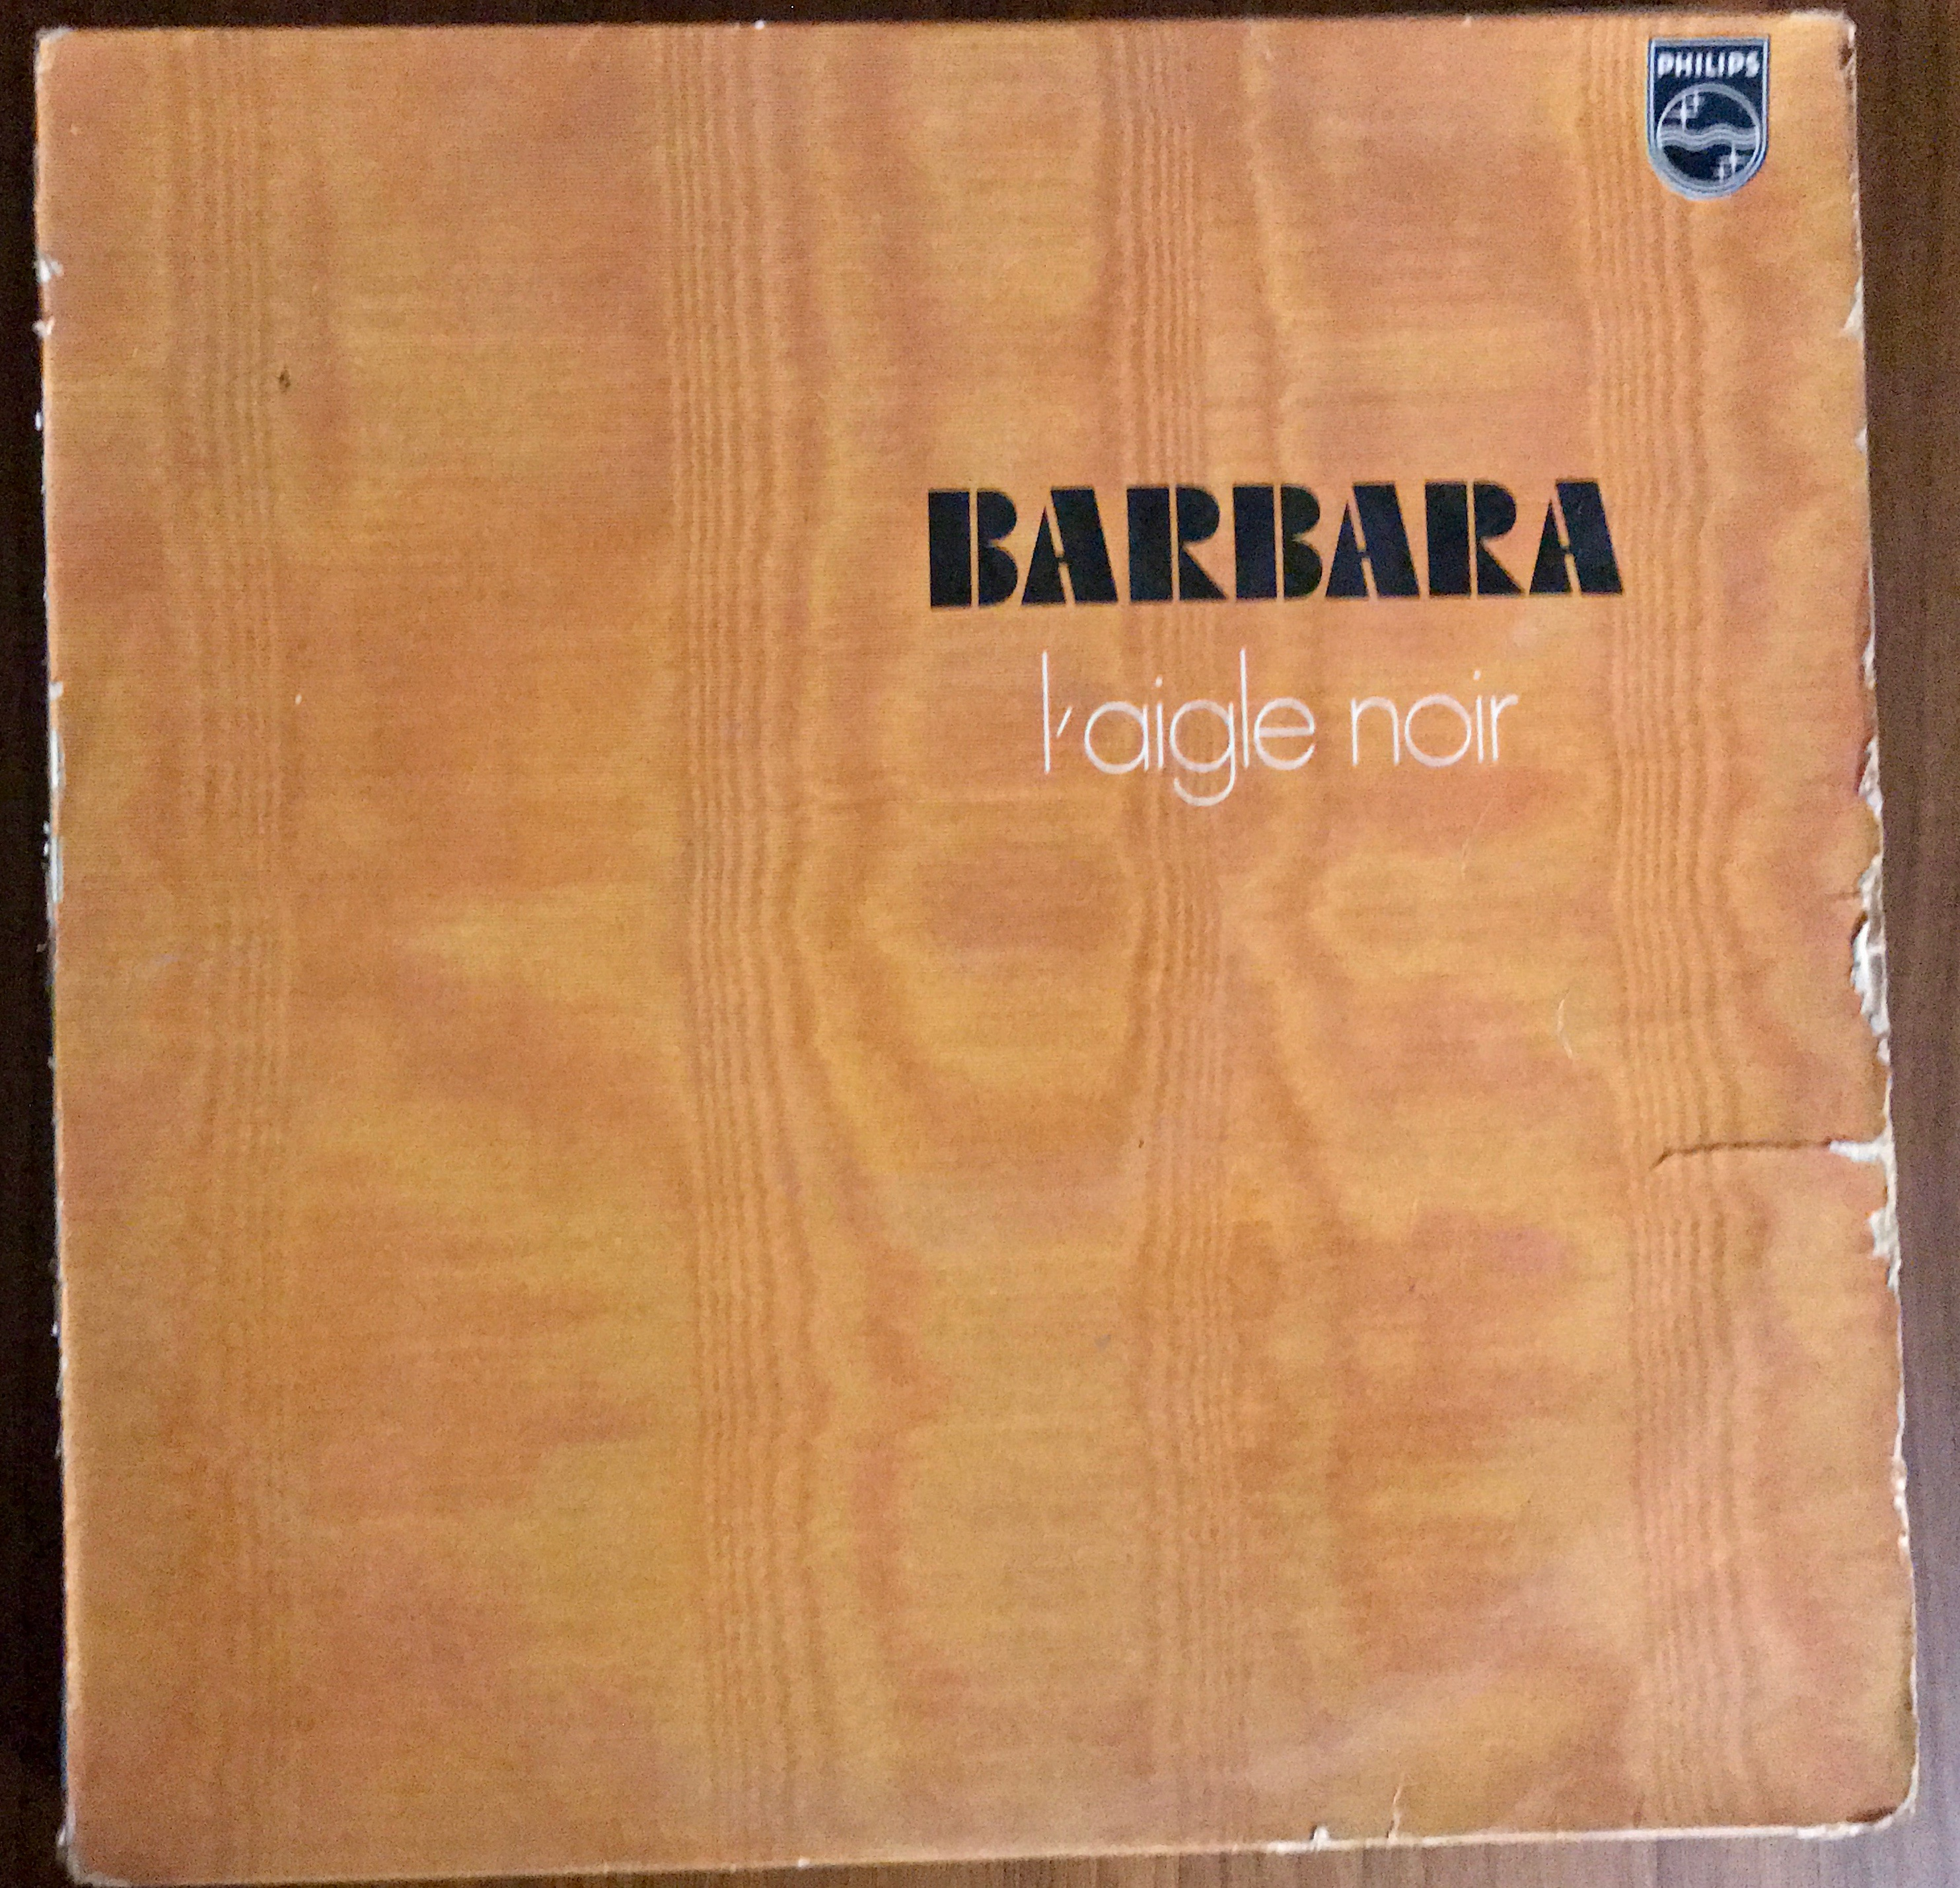 Disque vynile Barbara